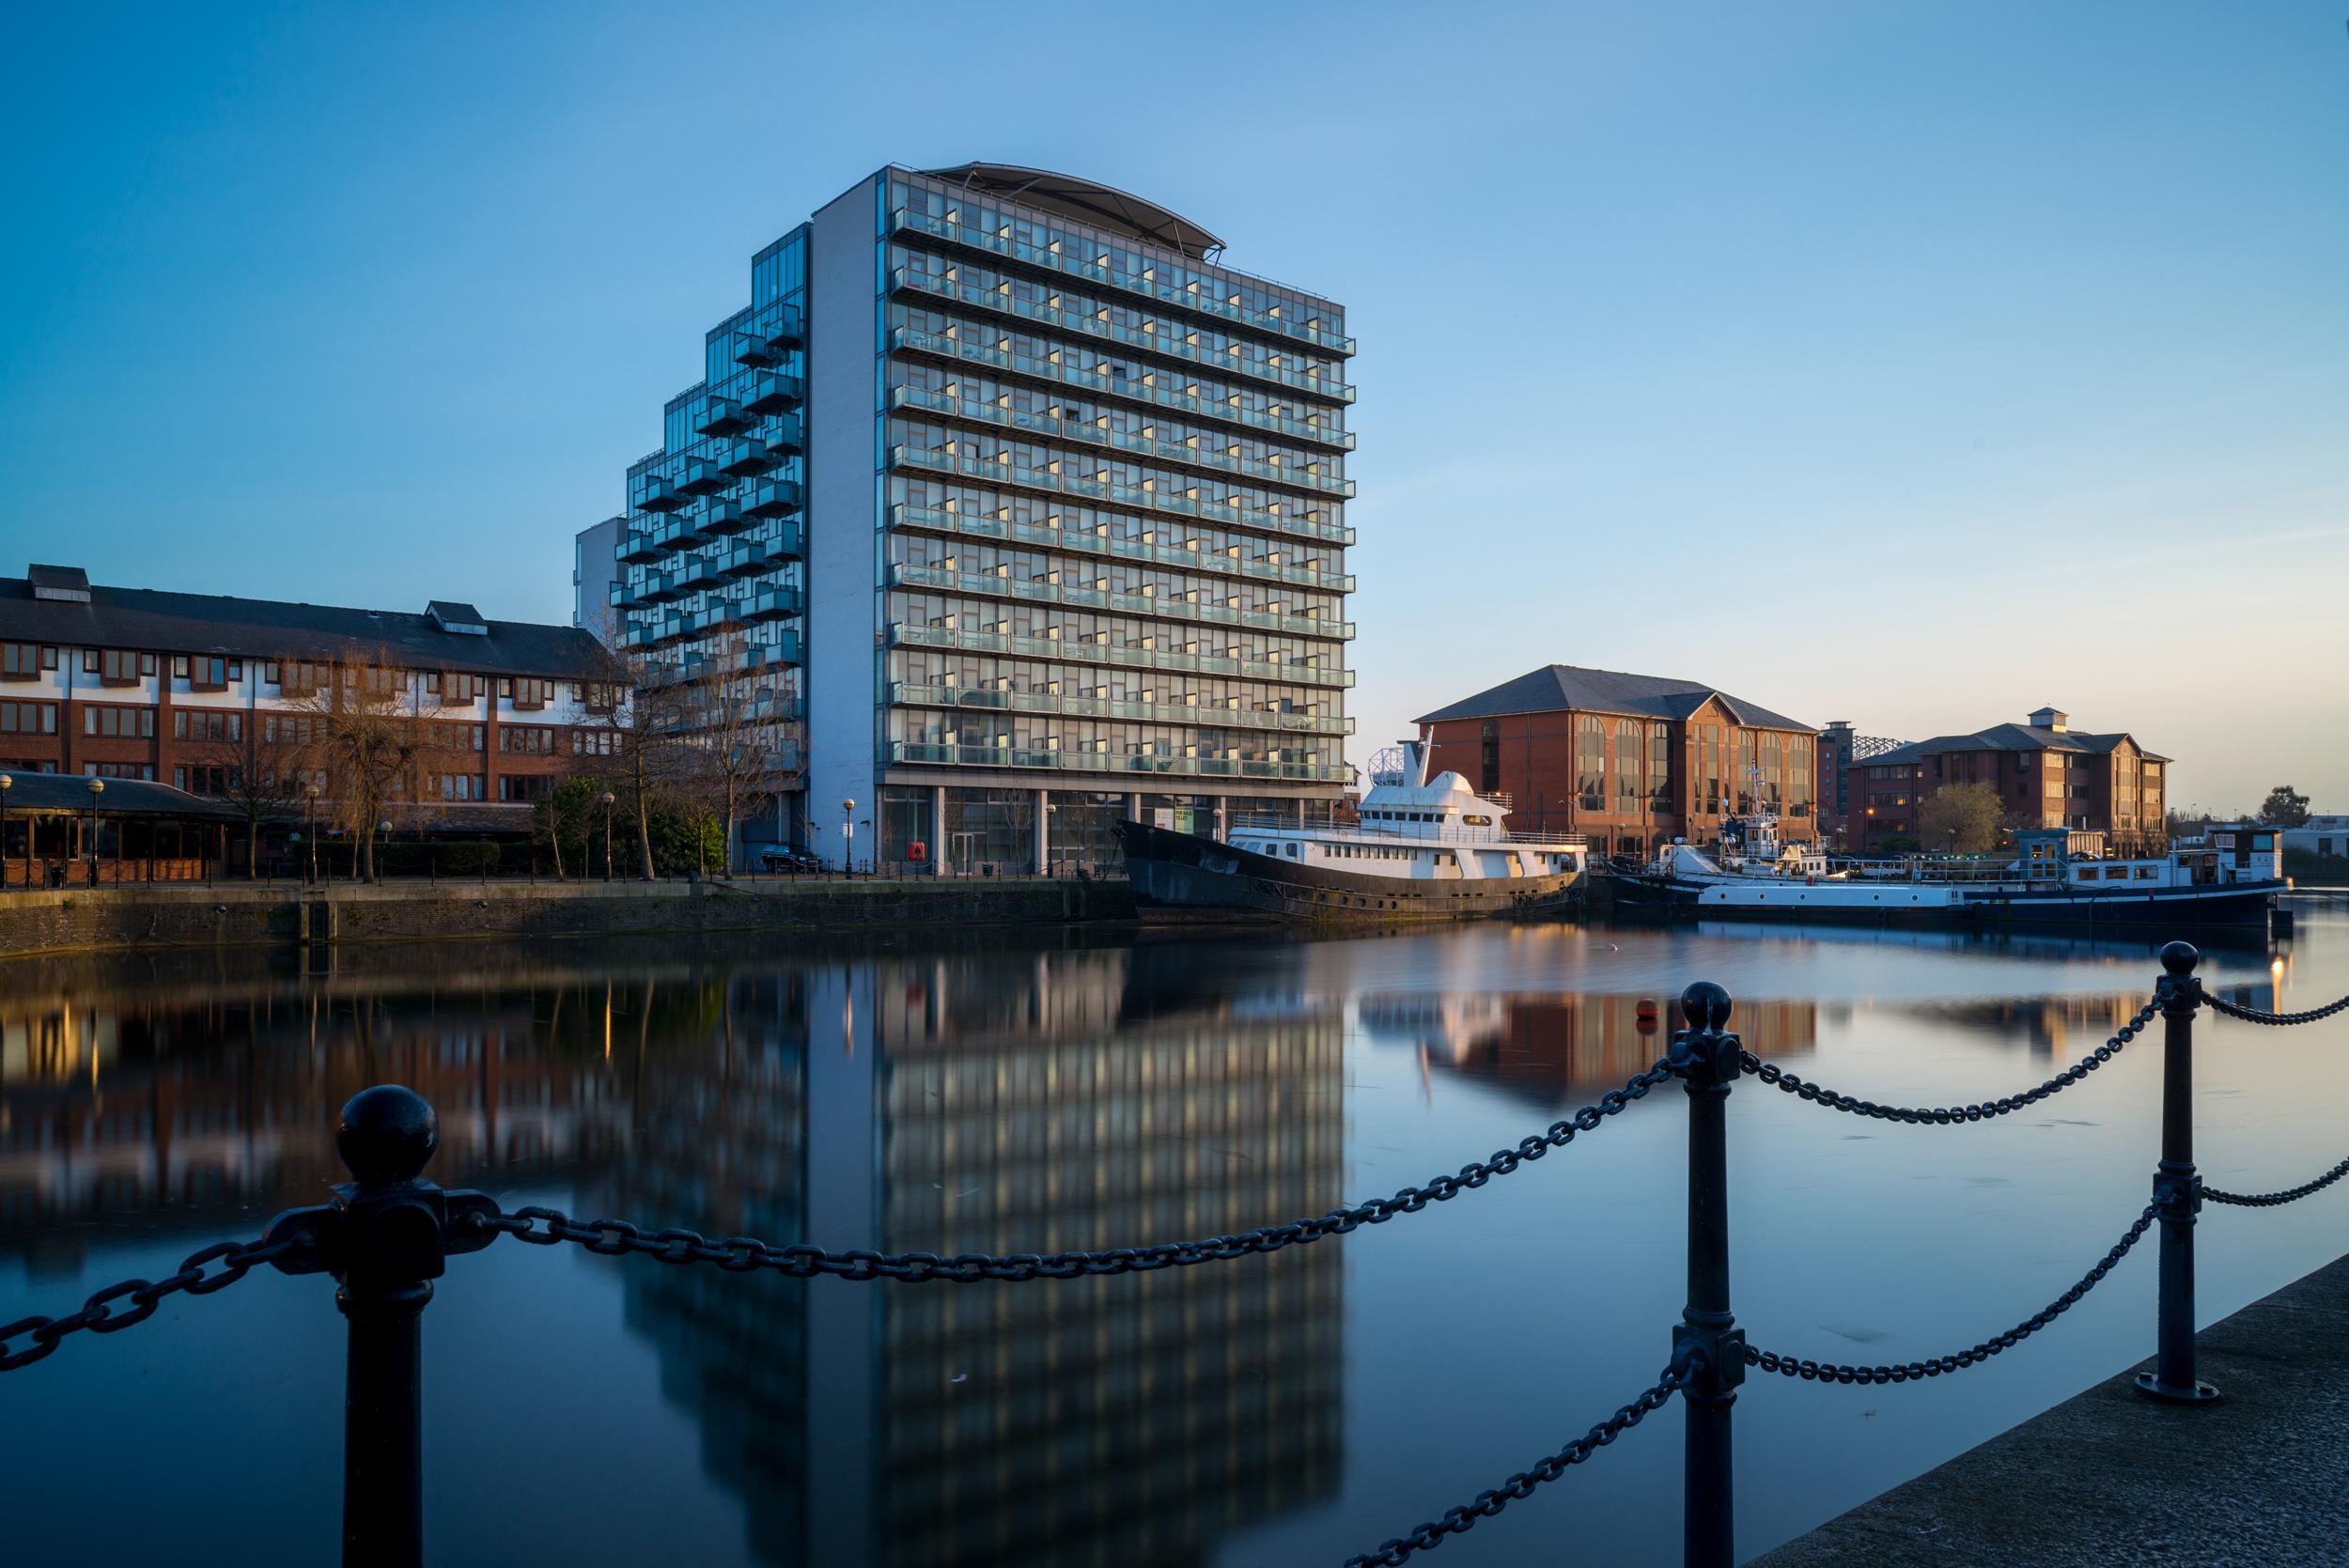 Abito Apartments - Manchester